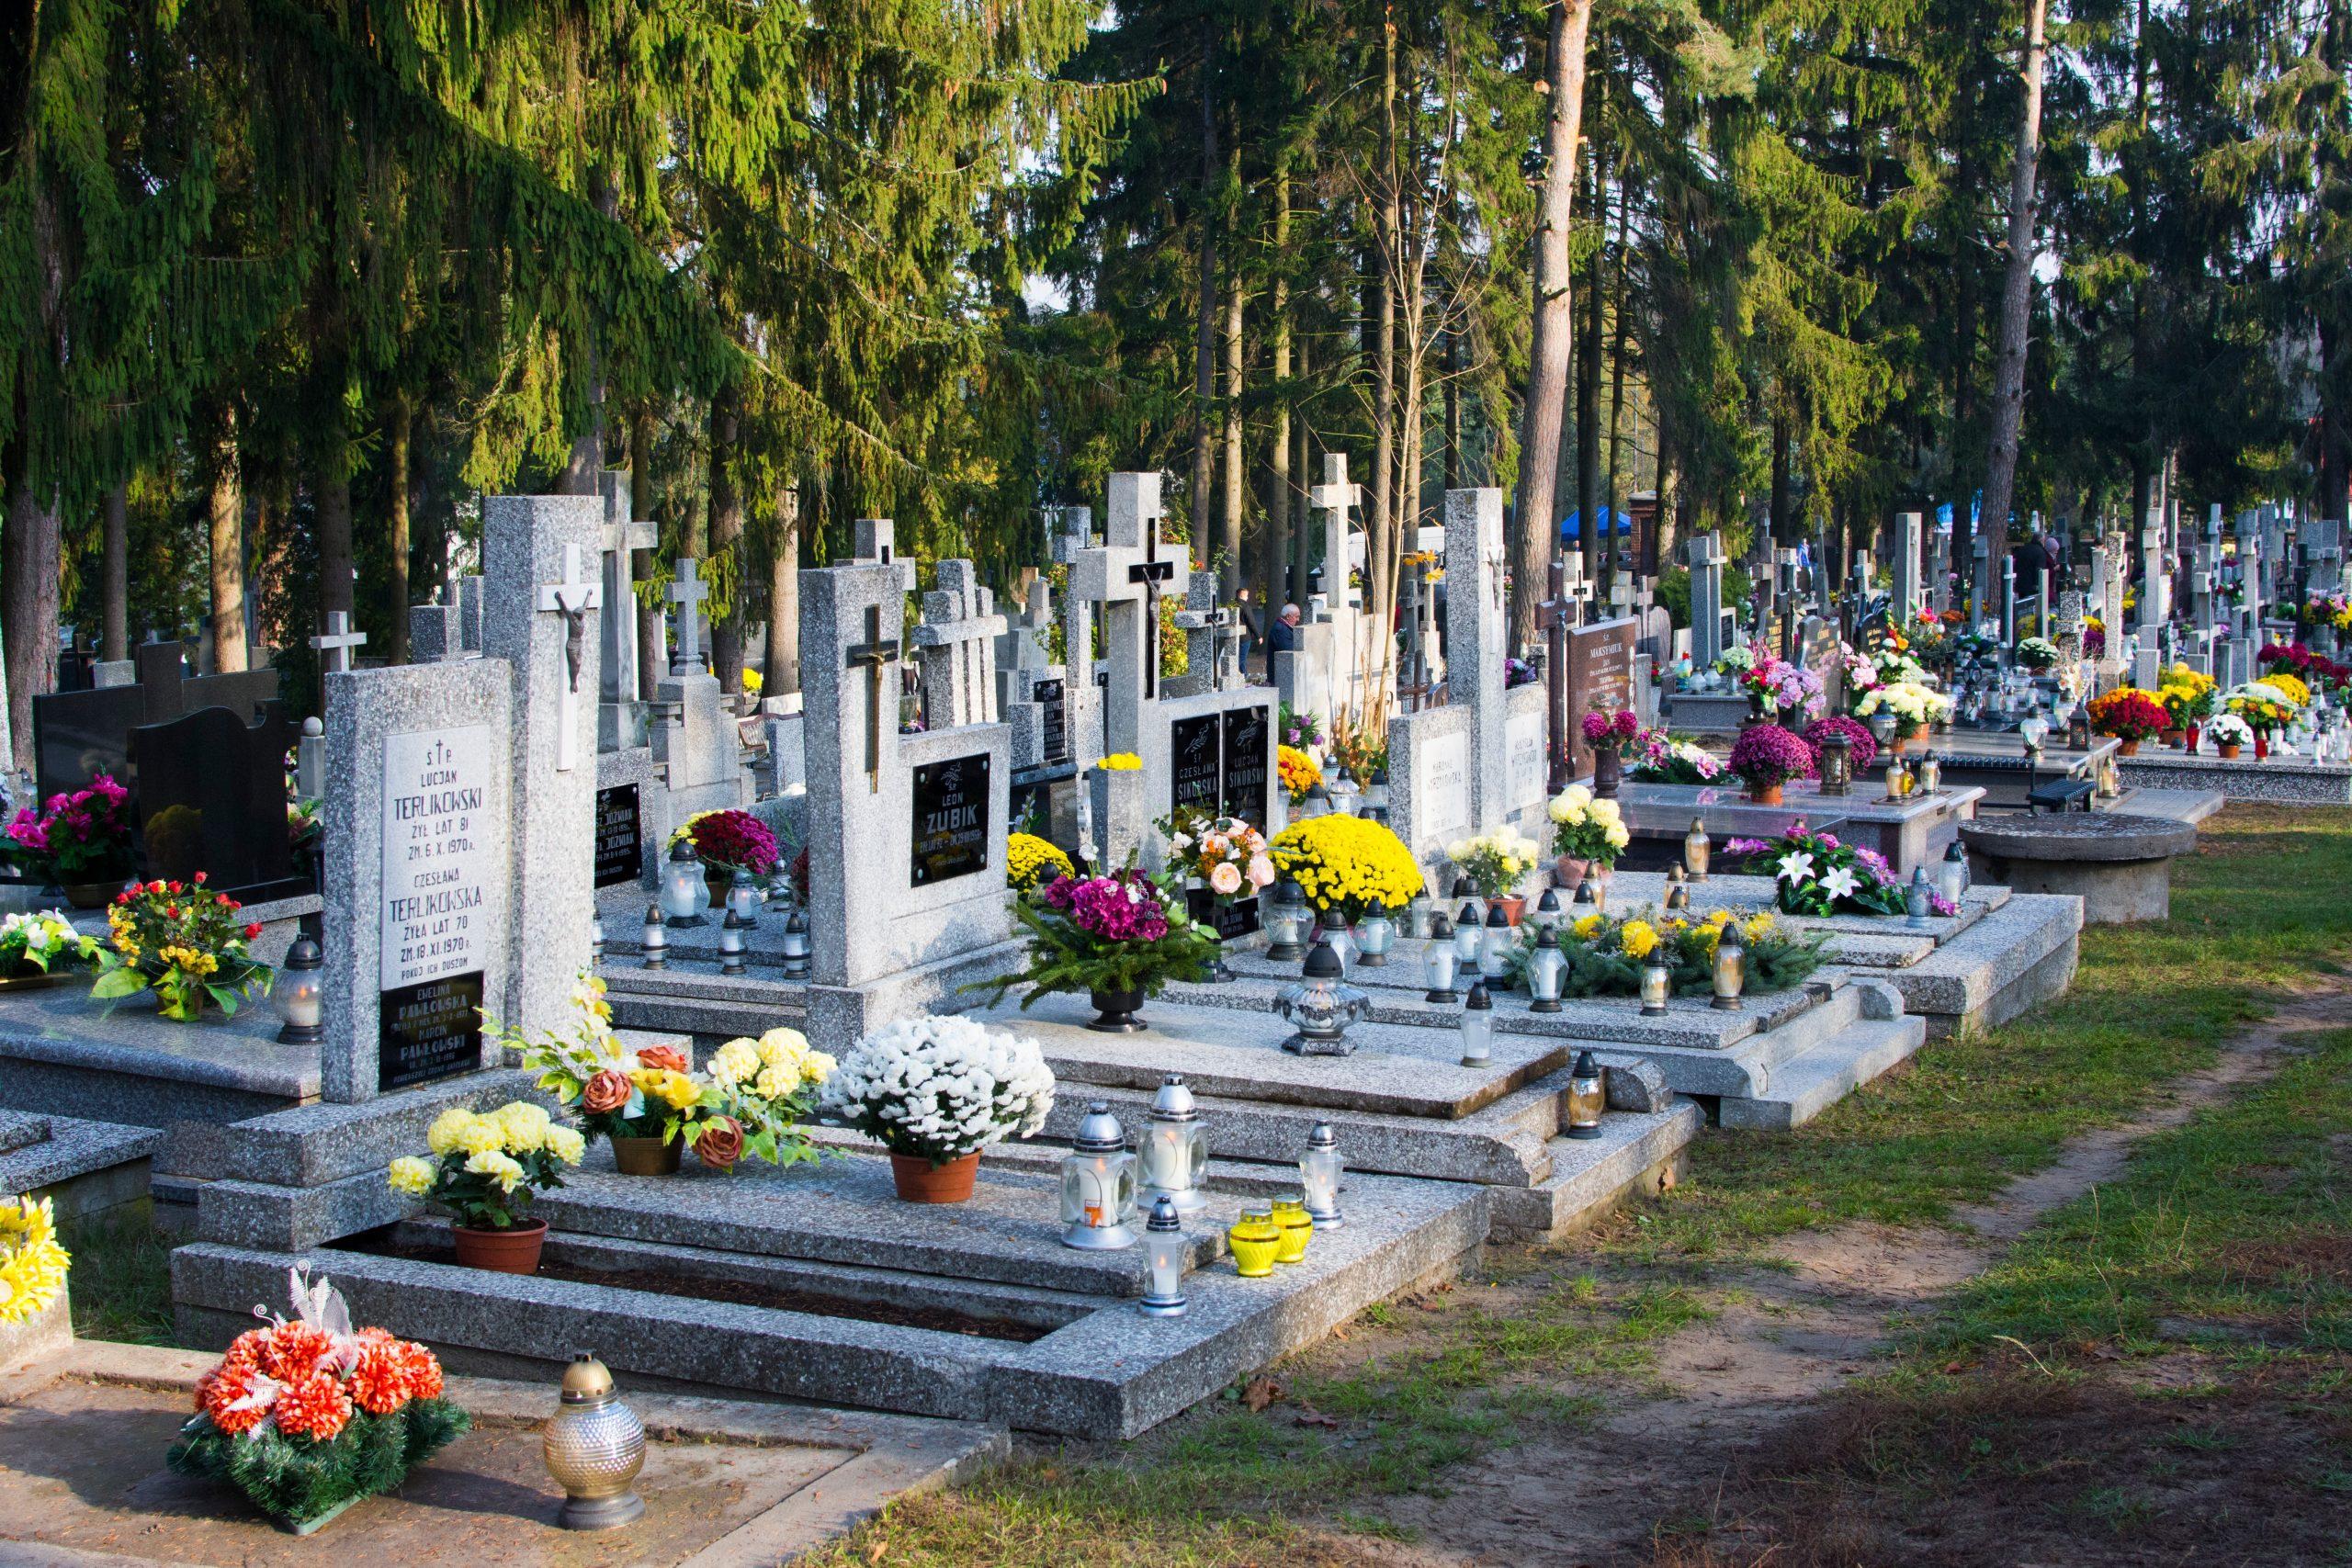 A graveyard in Poland